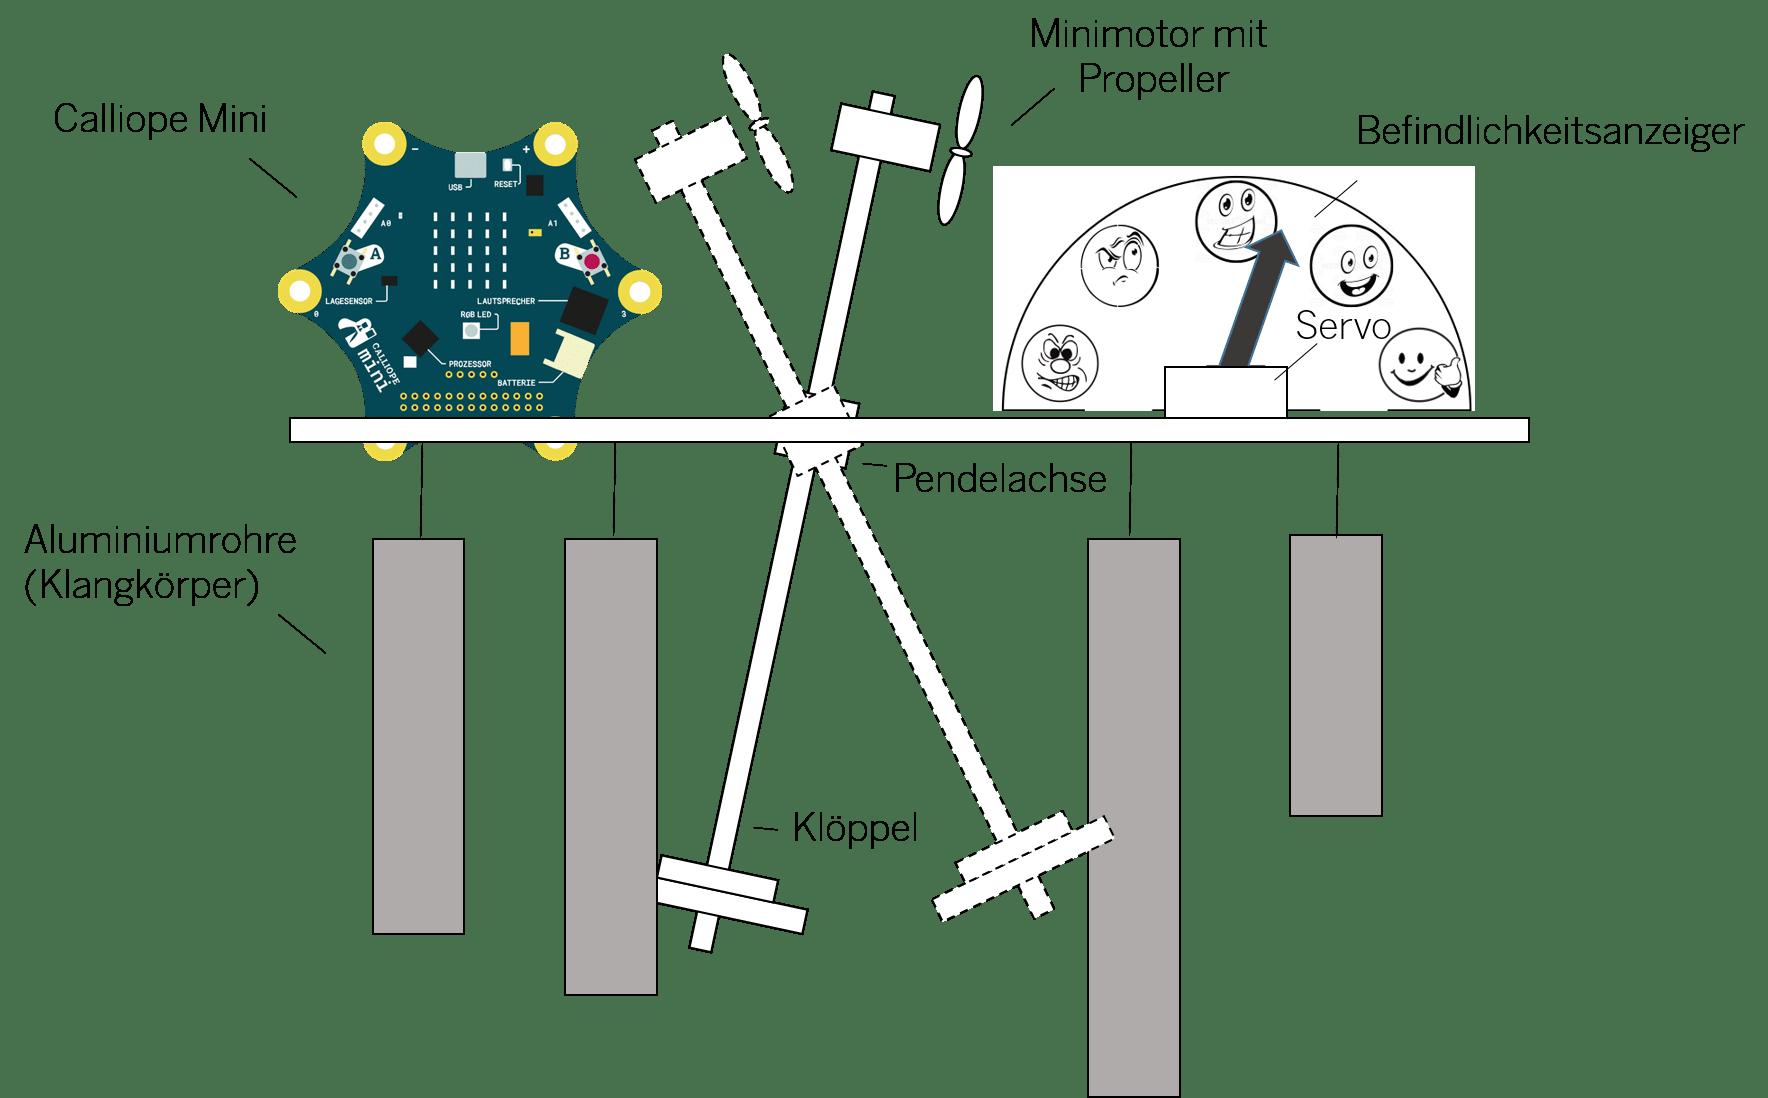 Schema des Lärm-O-Meters